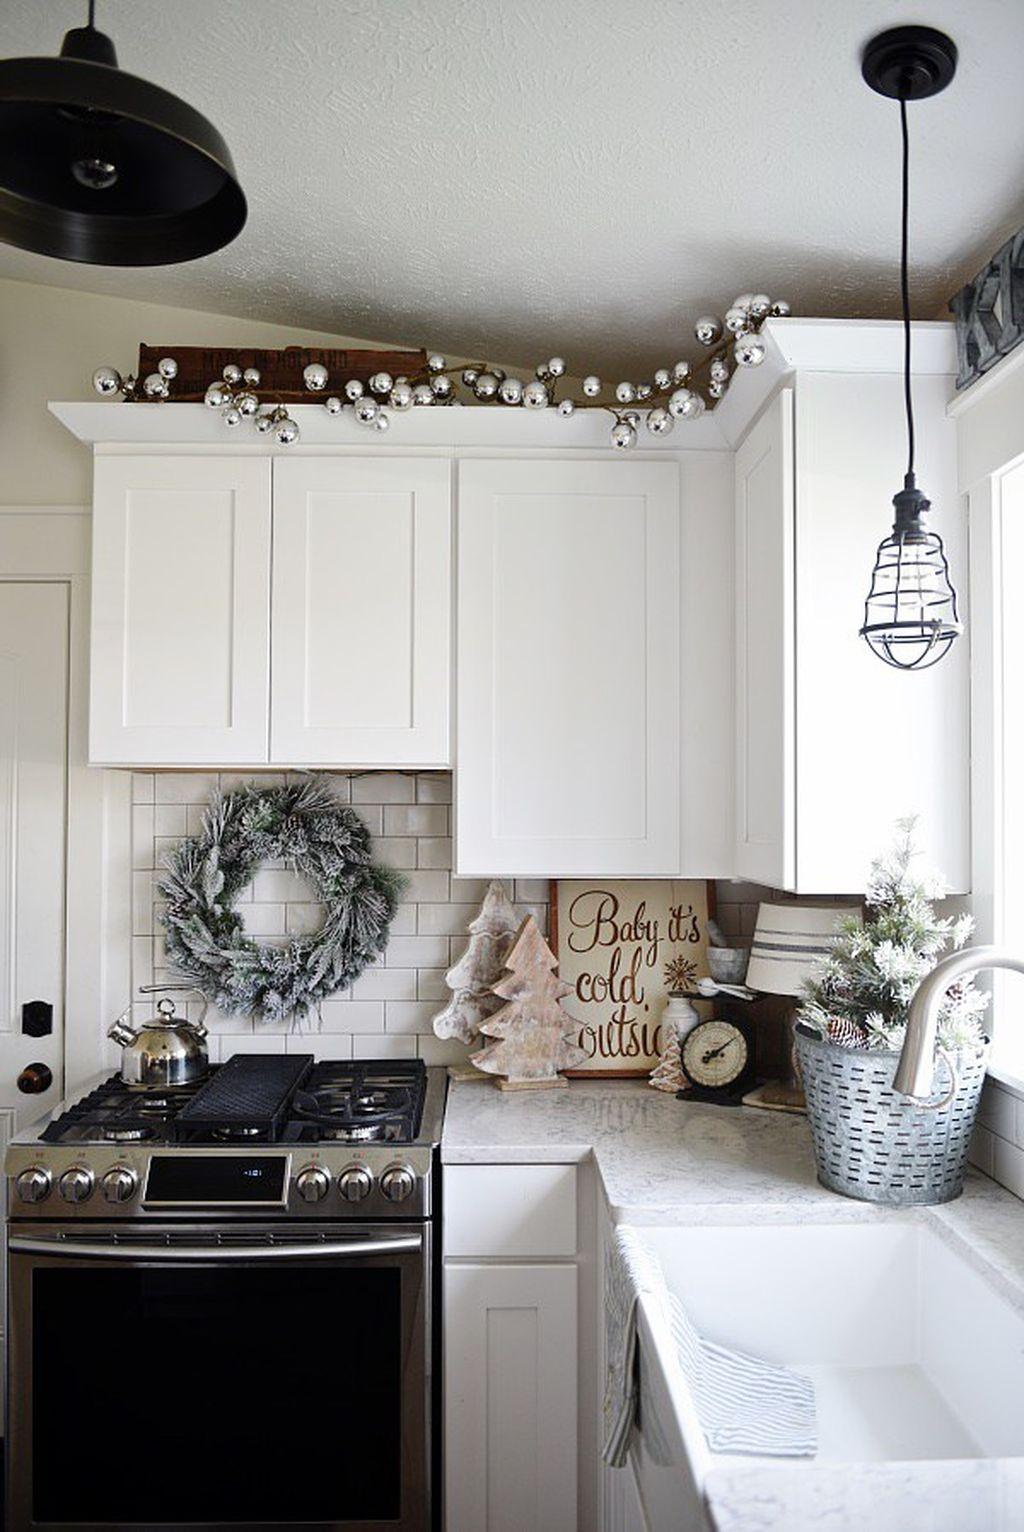 Adorable Rustic Christmas Kitchen Decoration Ideas 82